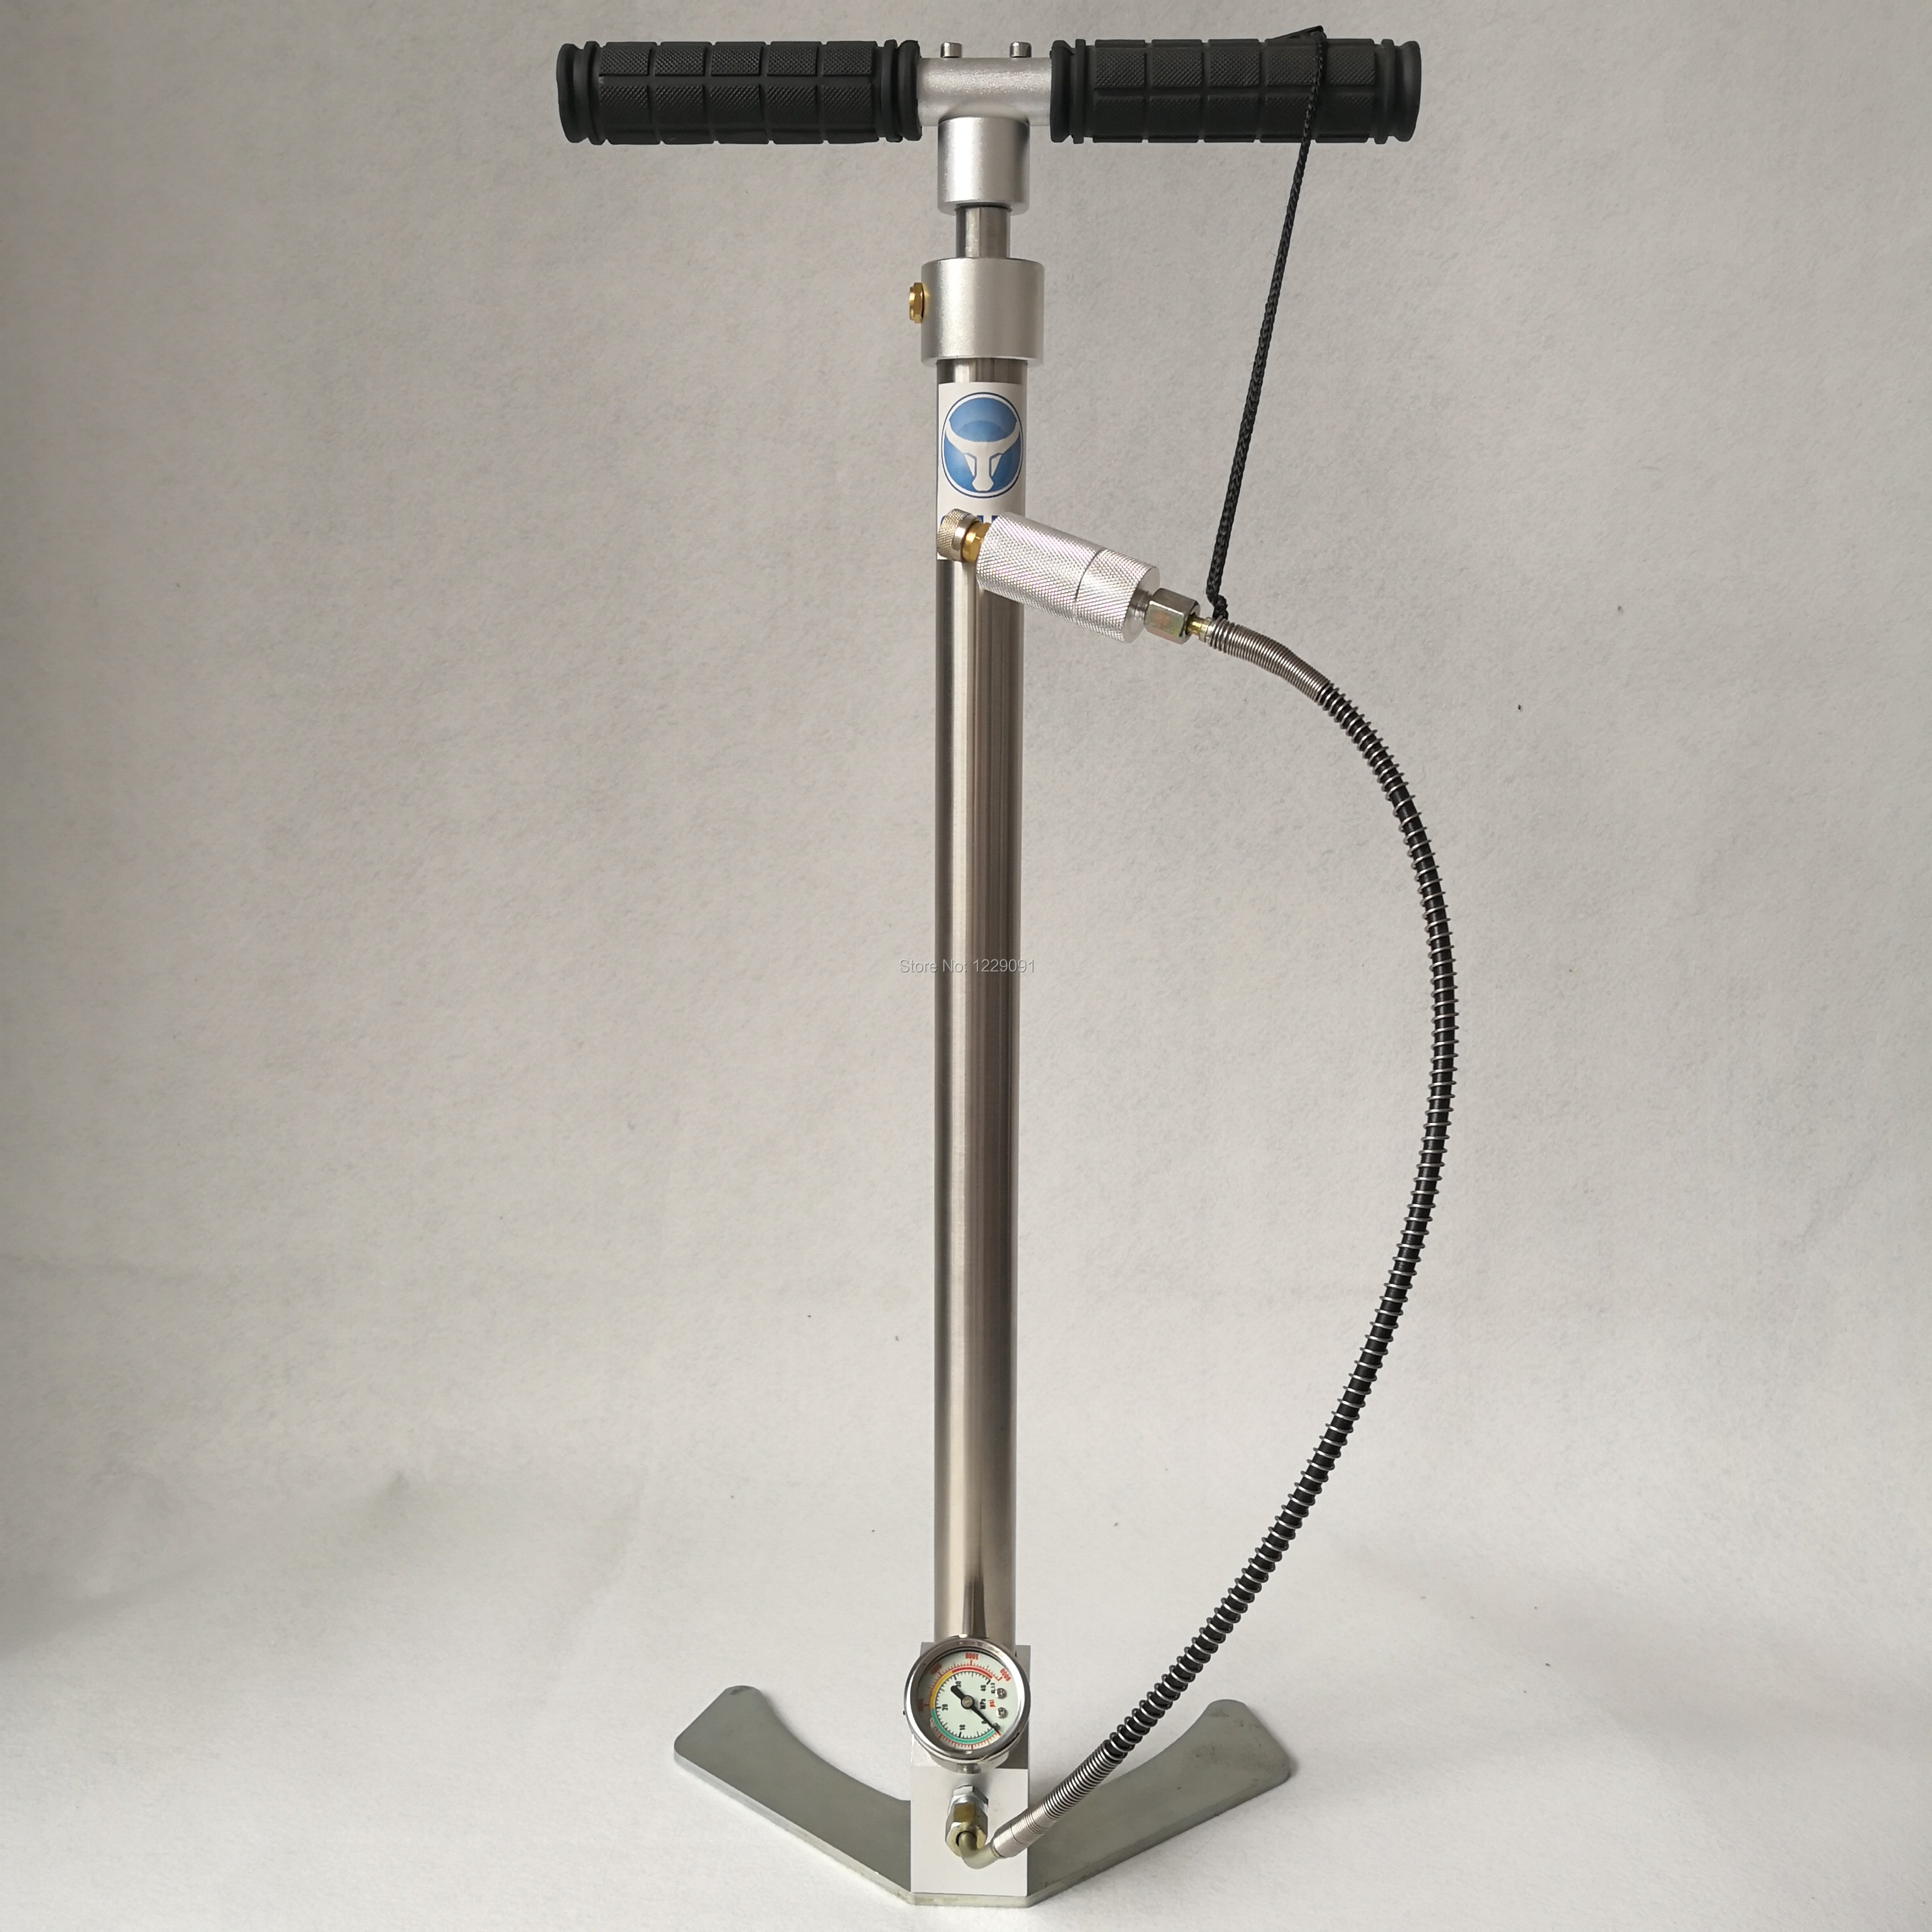 GAPPO Basin faucet basin mixer taps black faucet bathroom water tap sink mixer deck mounted torneira